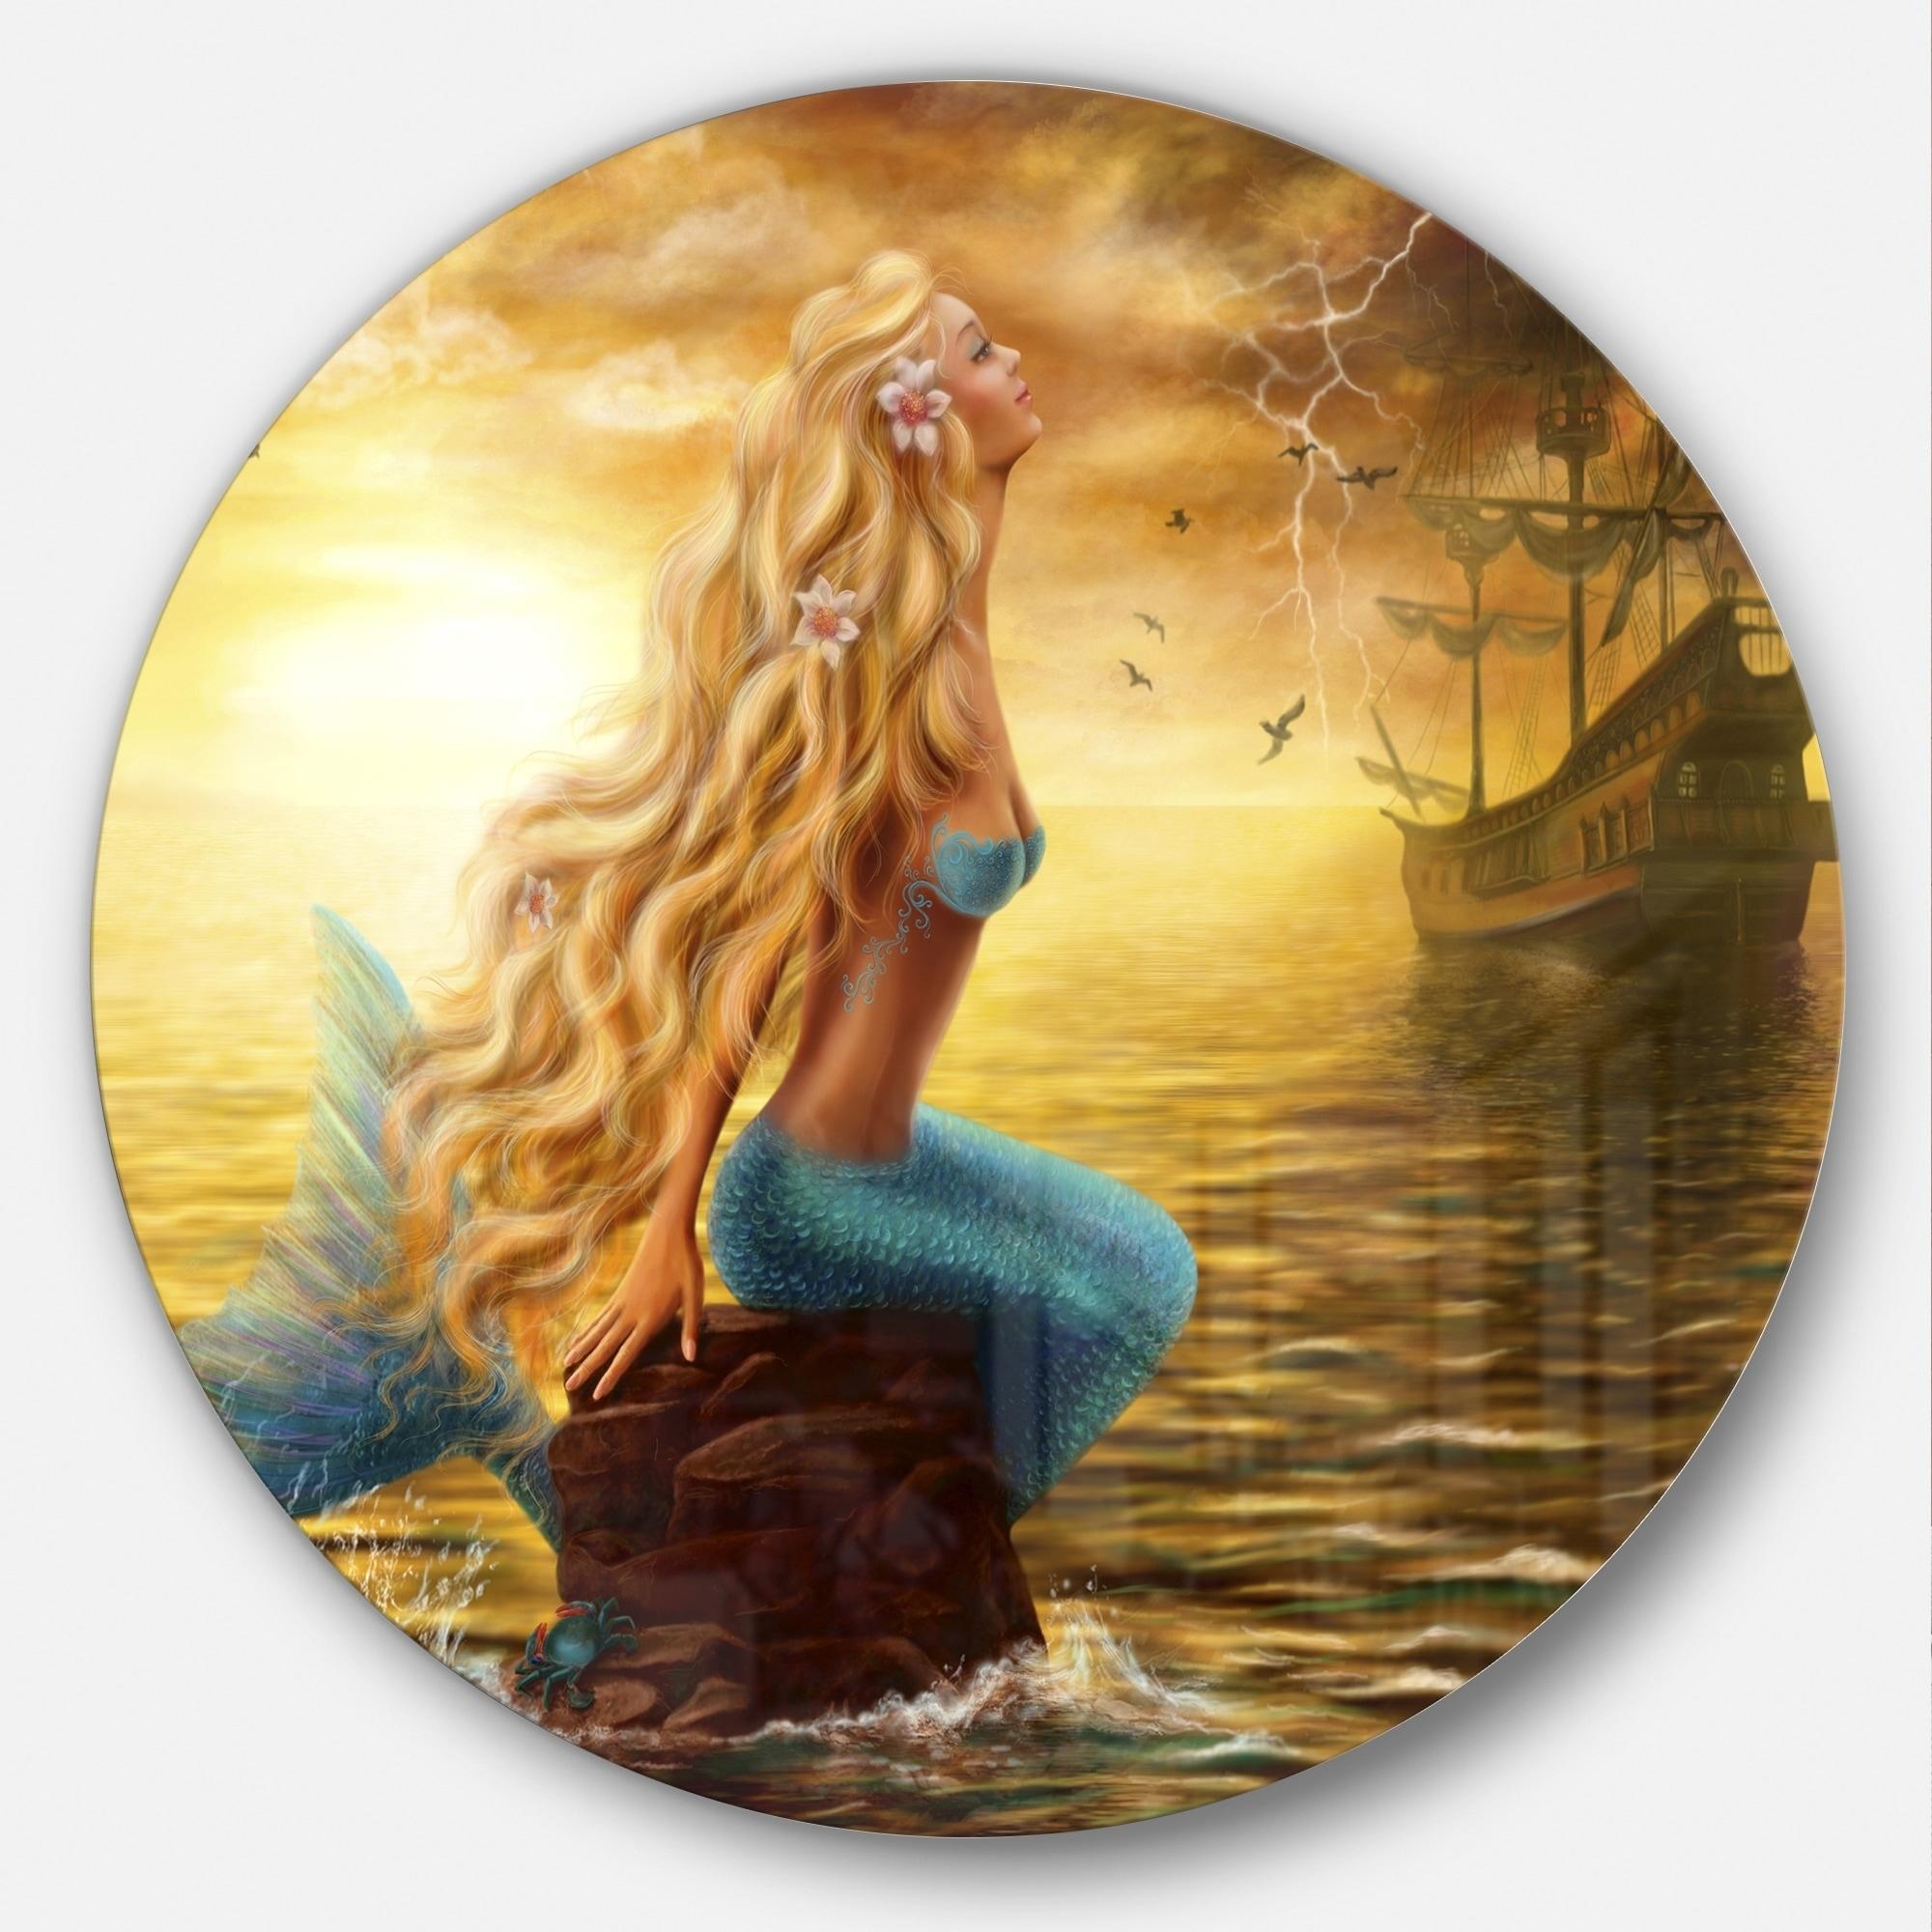 Shop Designart \'Sea Mermaid with Ghost Ship\' Seascape Digital Art ...